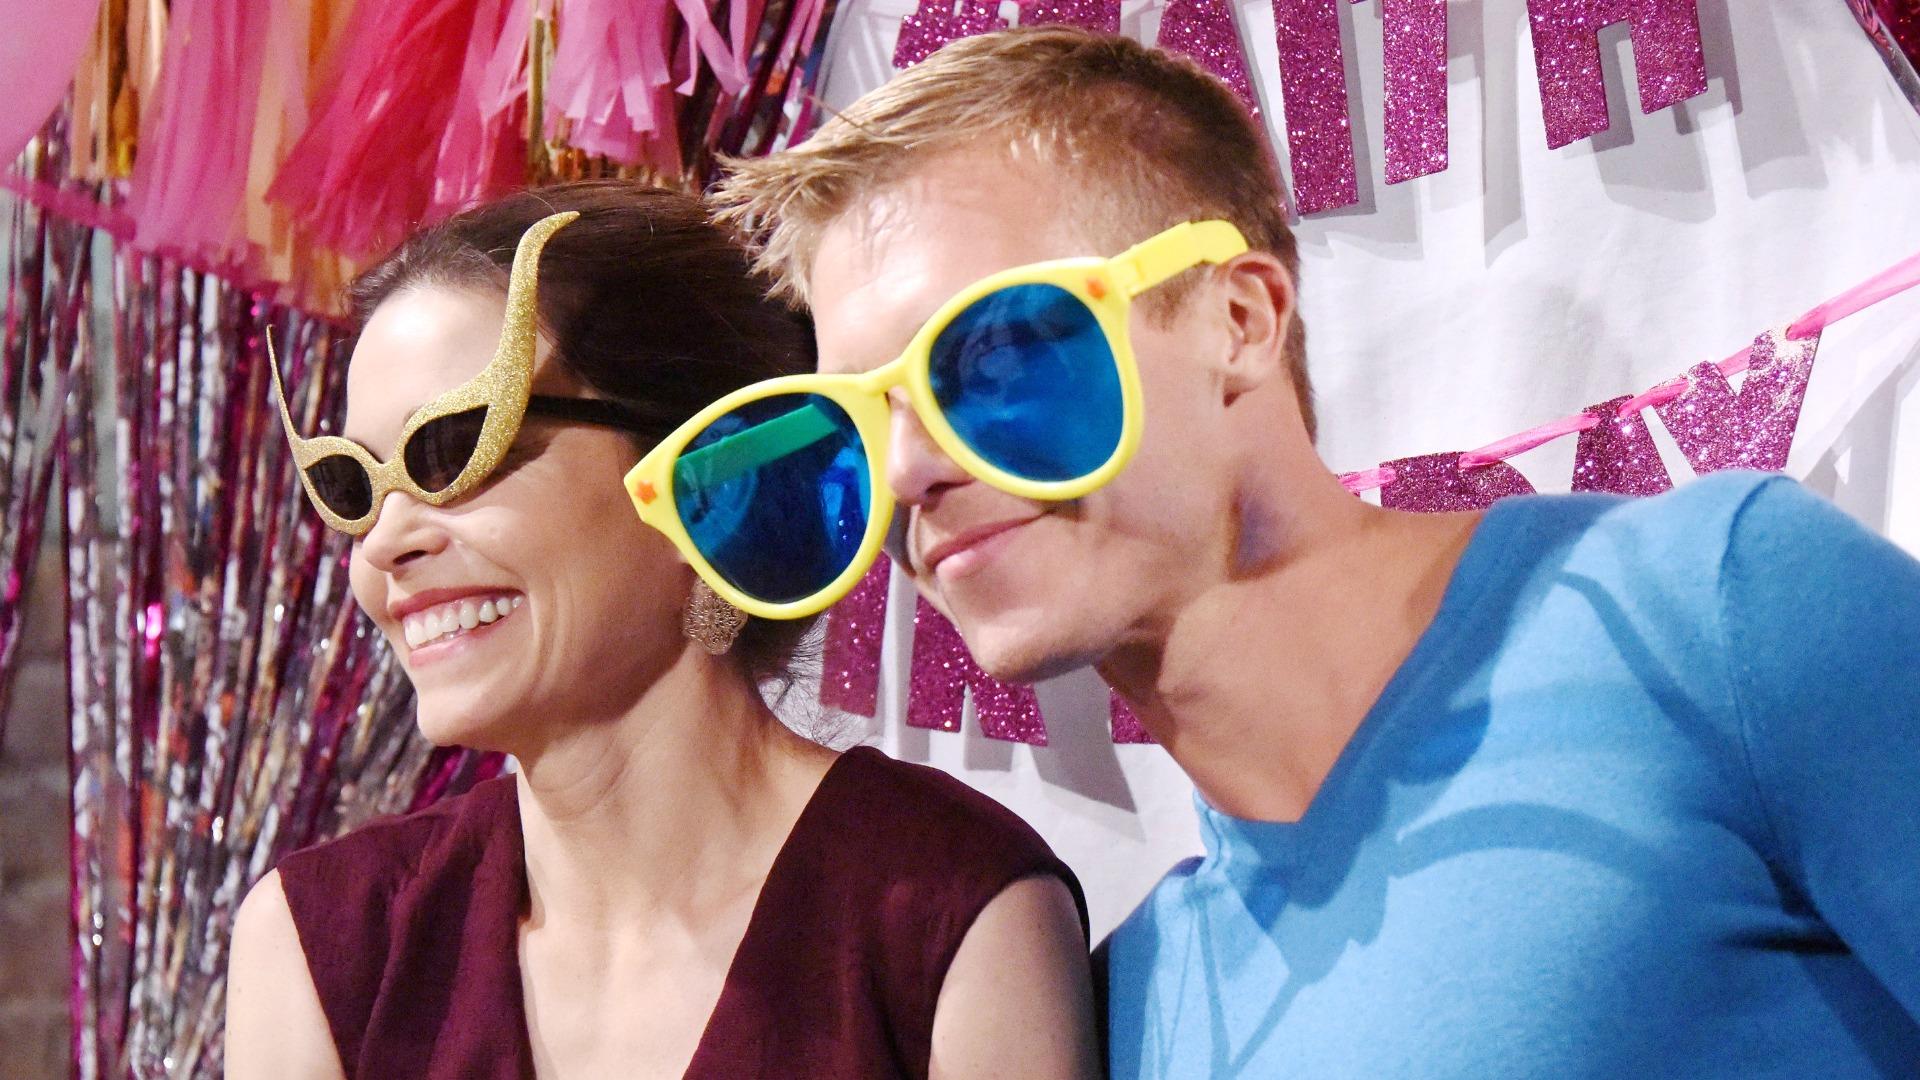 Victoria (Amelia Heinle) and Travis (Michael Roark) goofed around in wacky sunglasses.